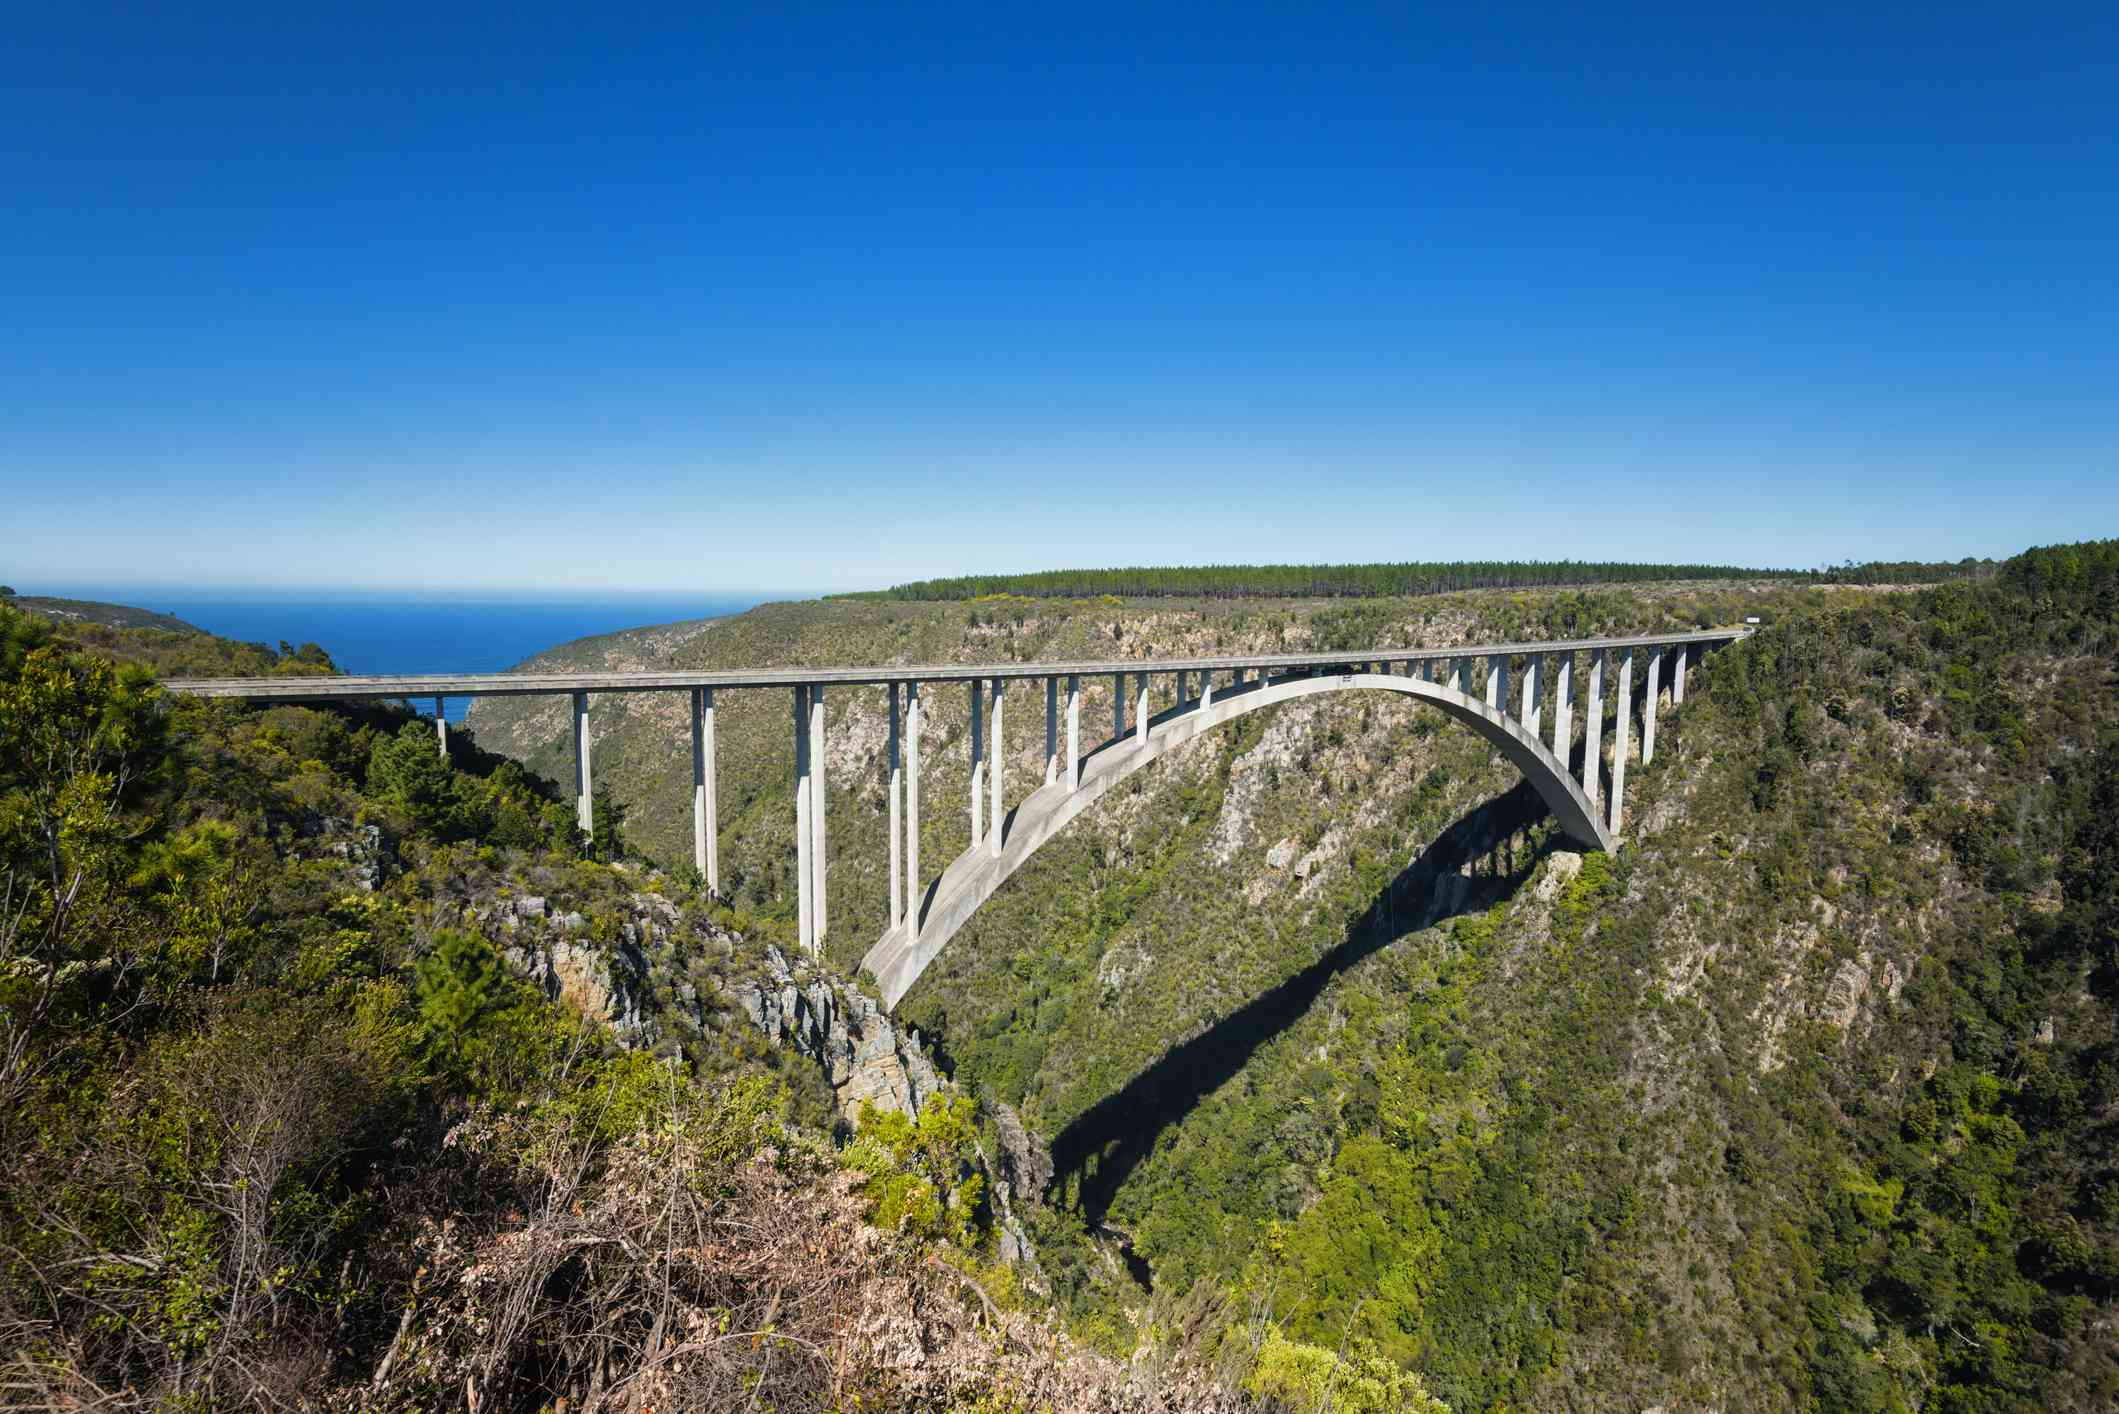 Bloukrans Bridge bungee jump, South Africa